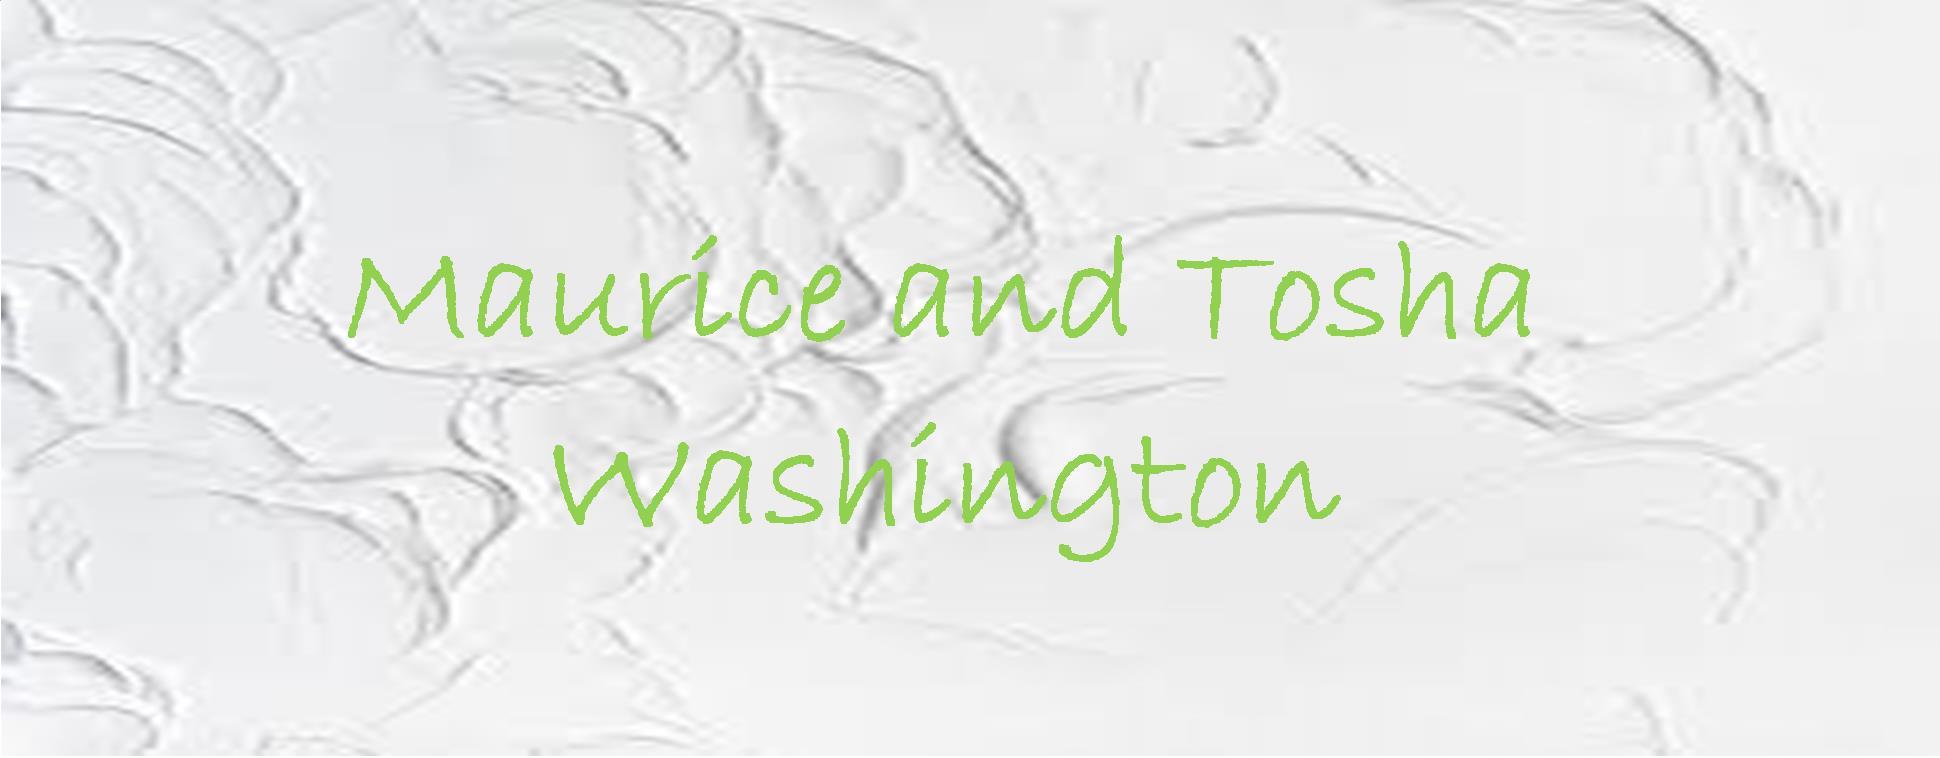 Maurice and Tosha Washington.jpg